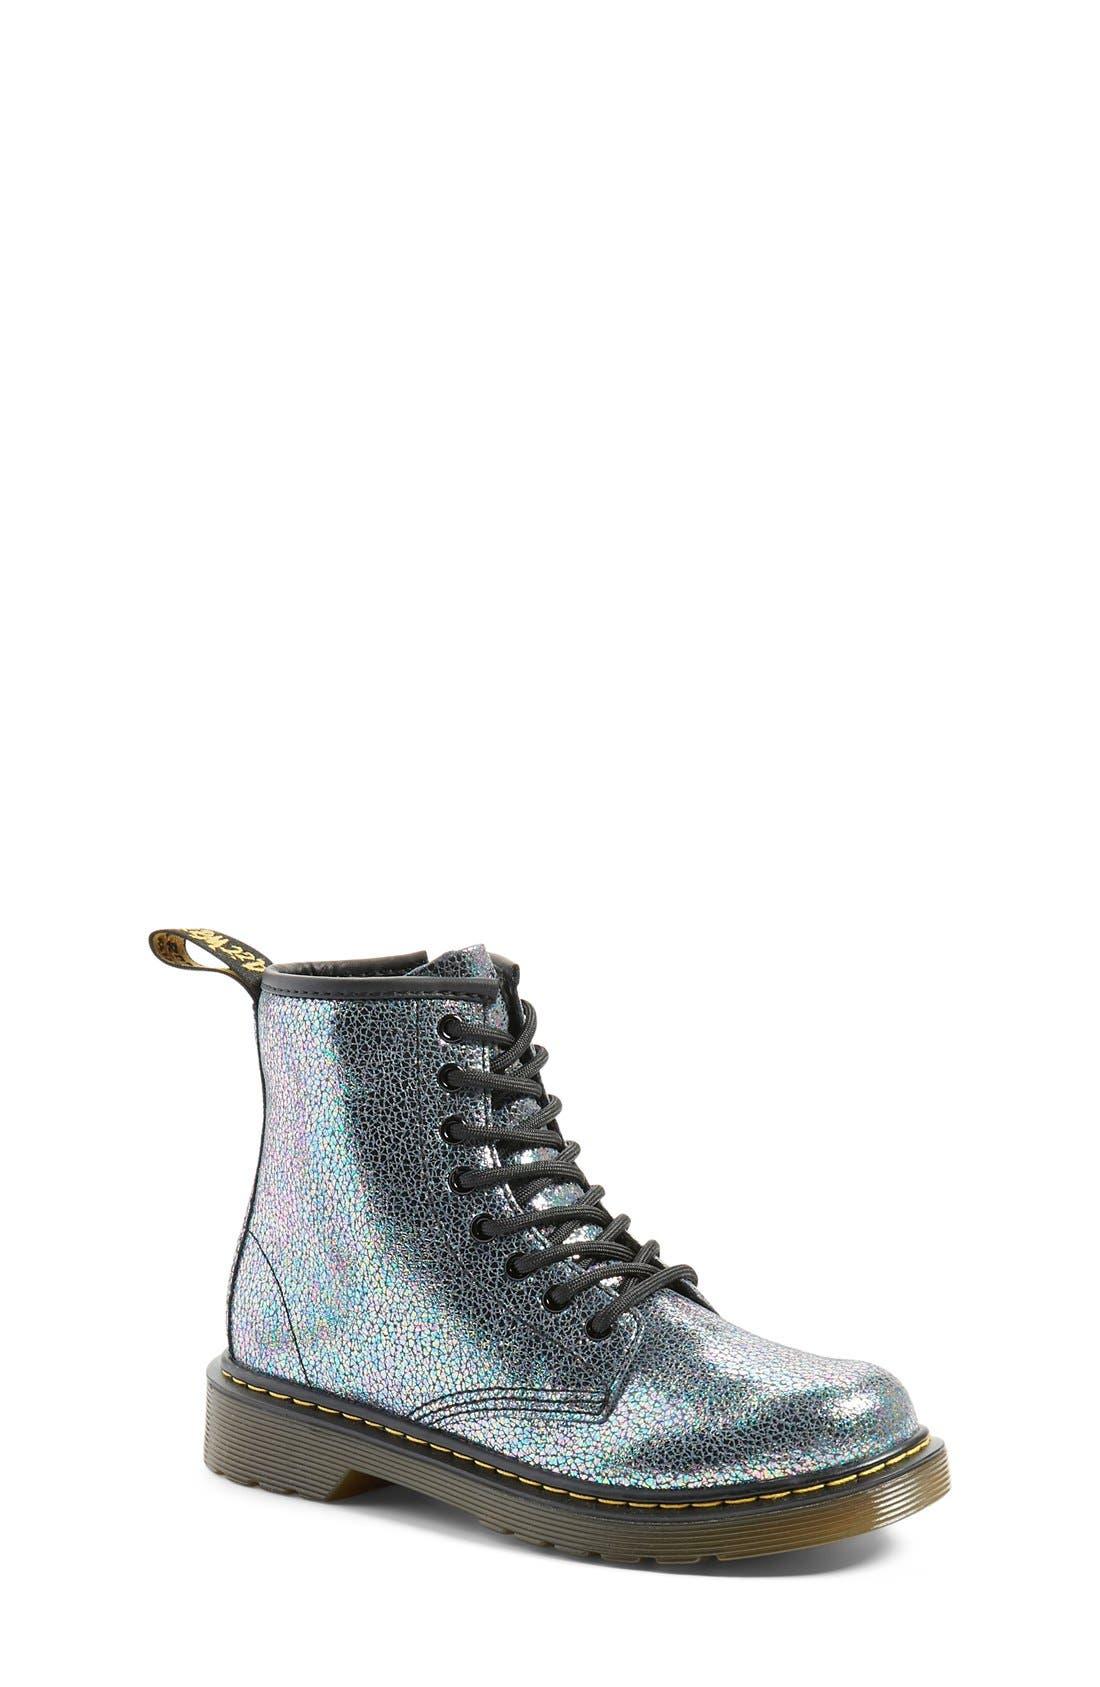 'Delaney' Boot, Main, color, 040